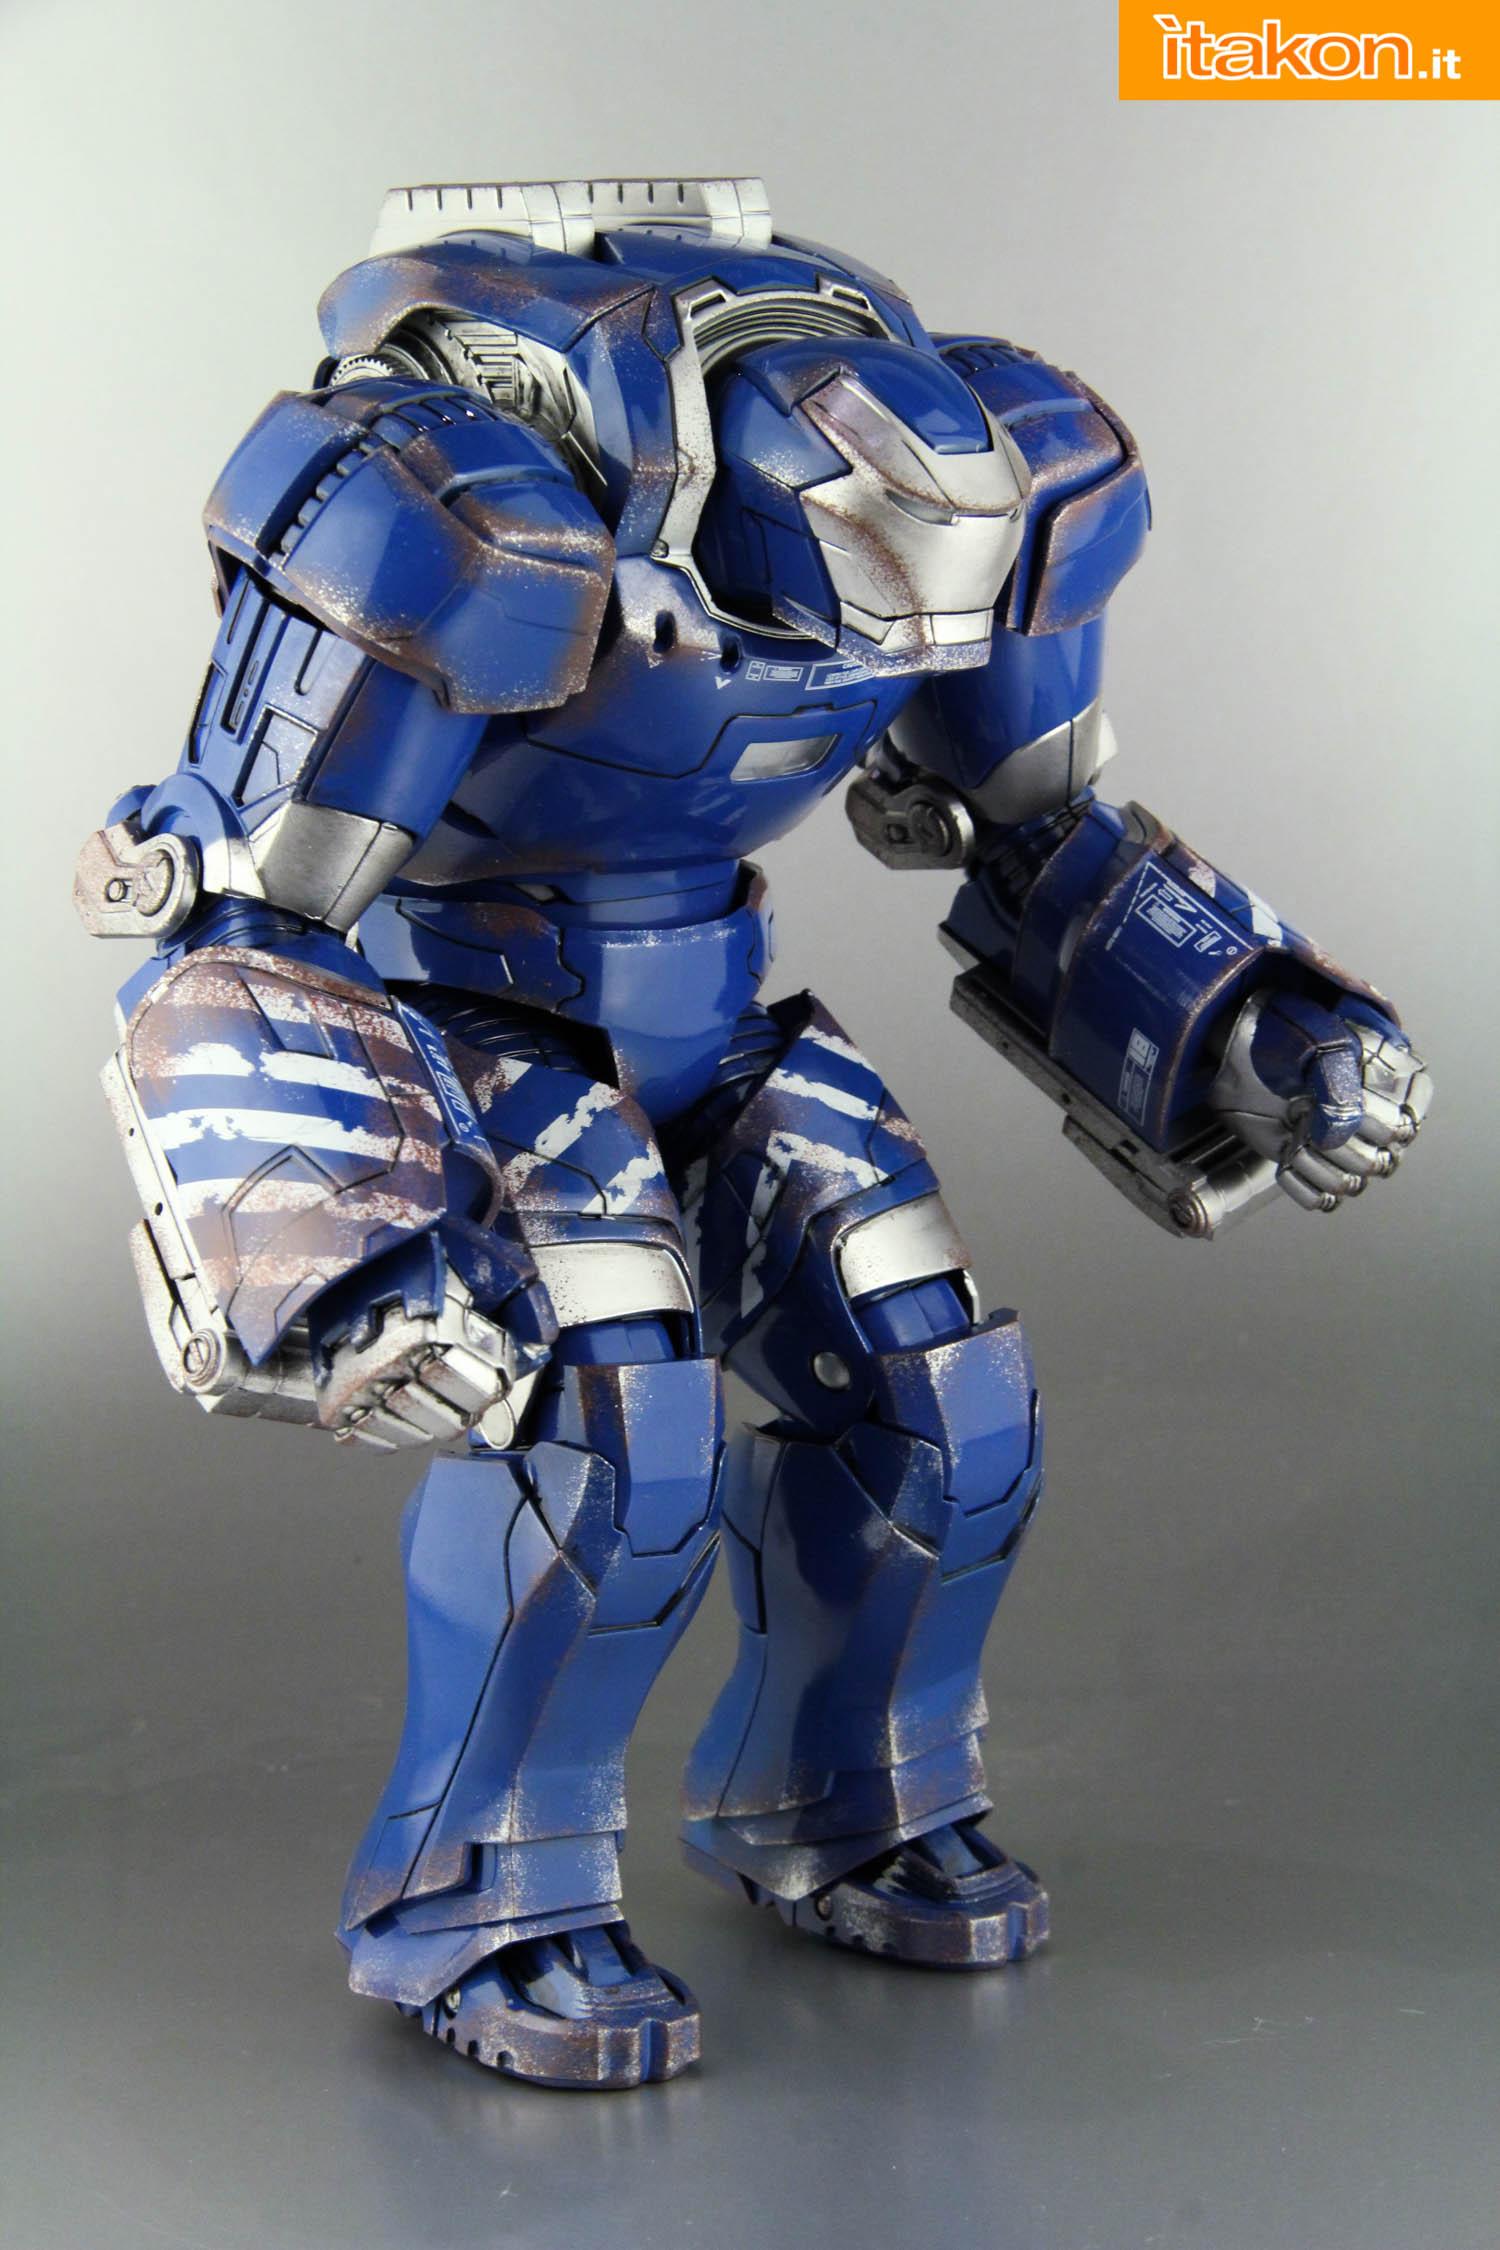 Link a comicave-igor-iron-man-figure-16